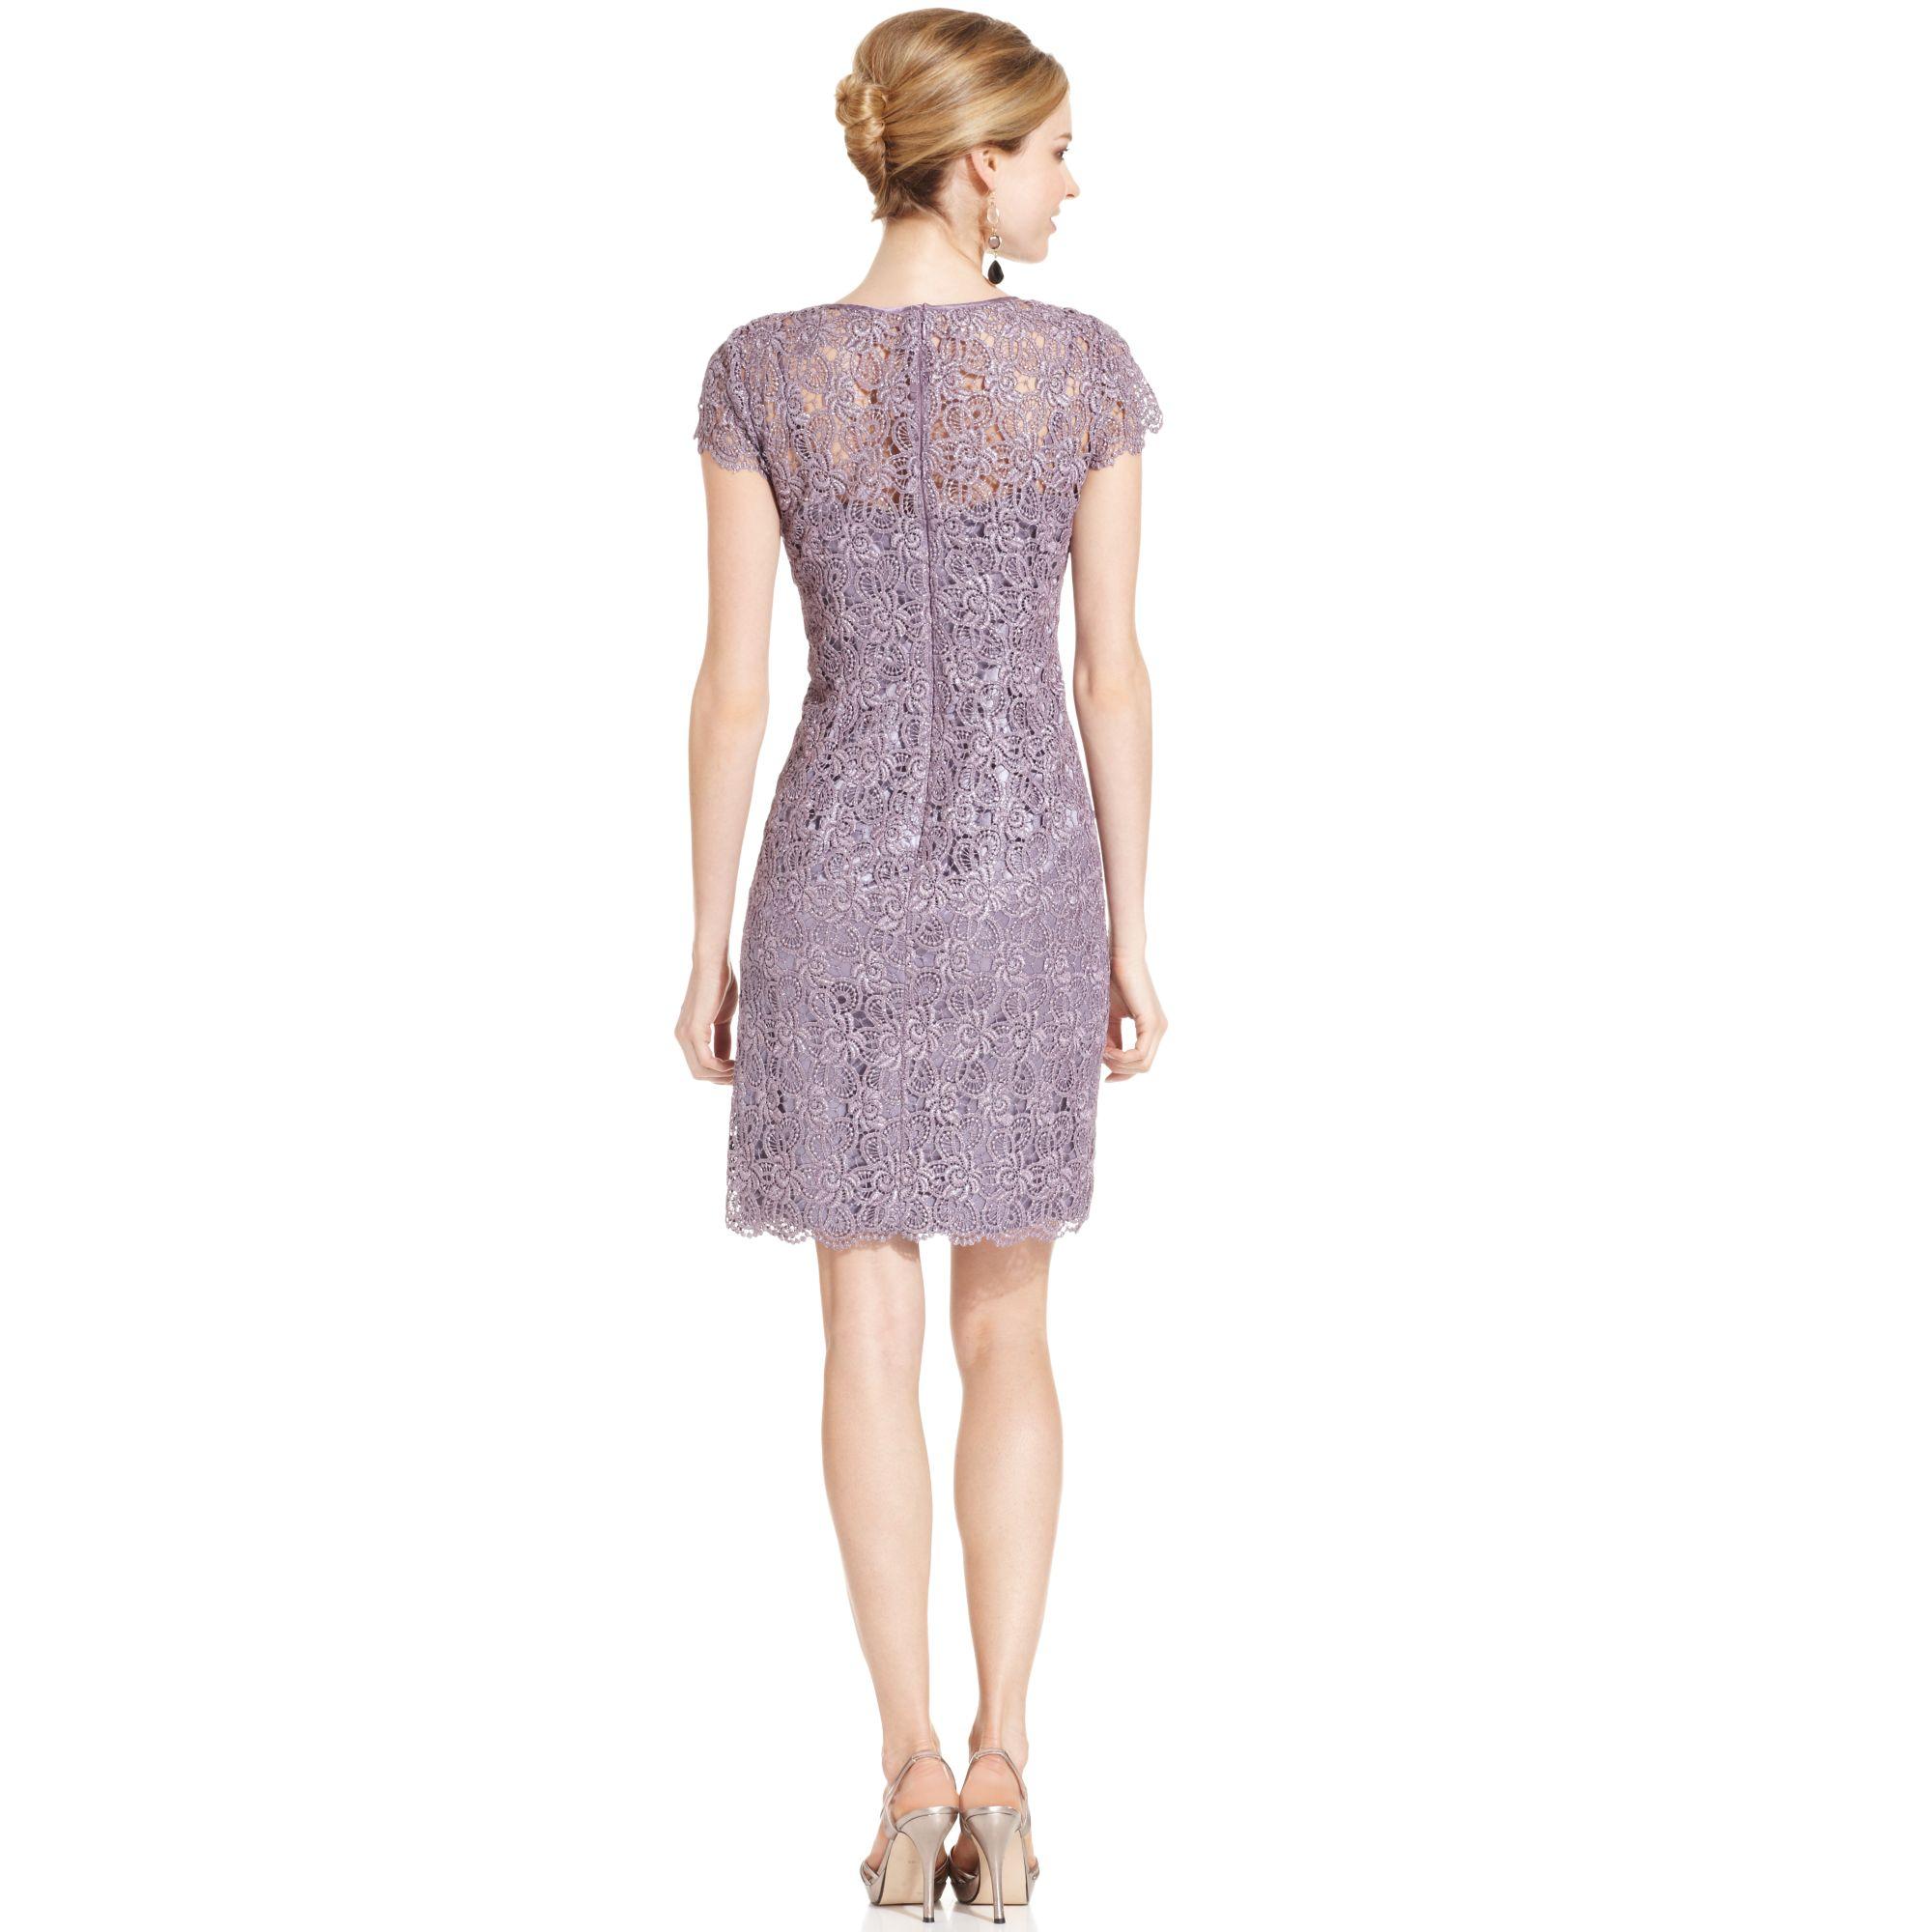 Patra Evening Dresses Cocktail Dresses 2016